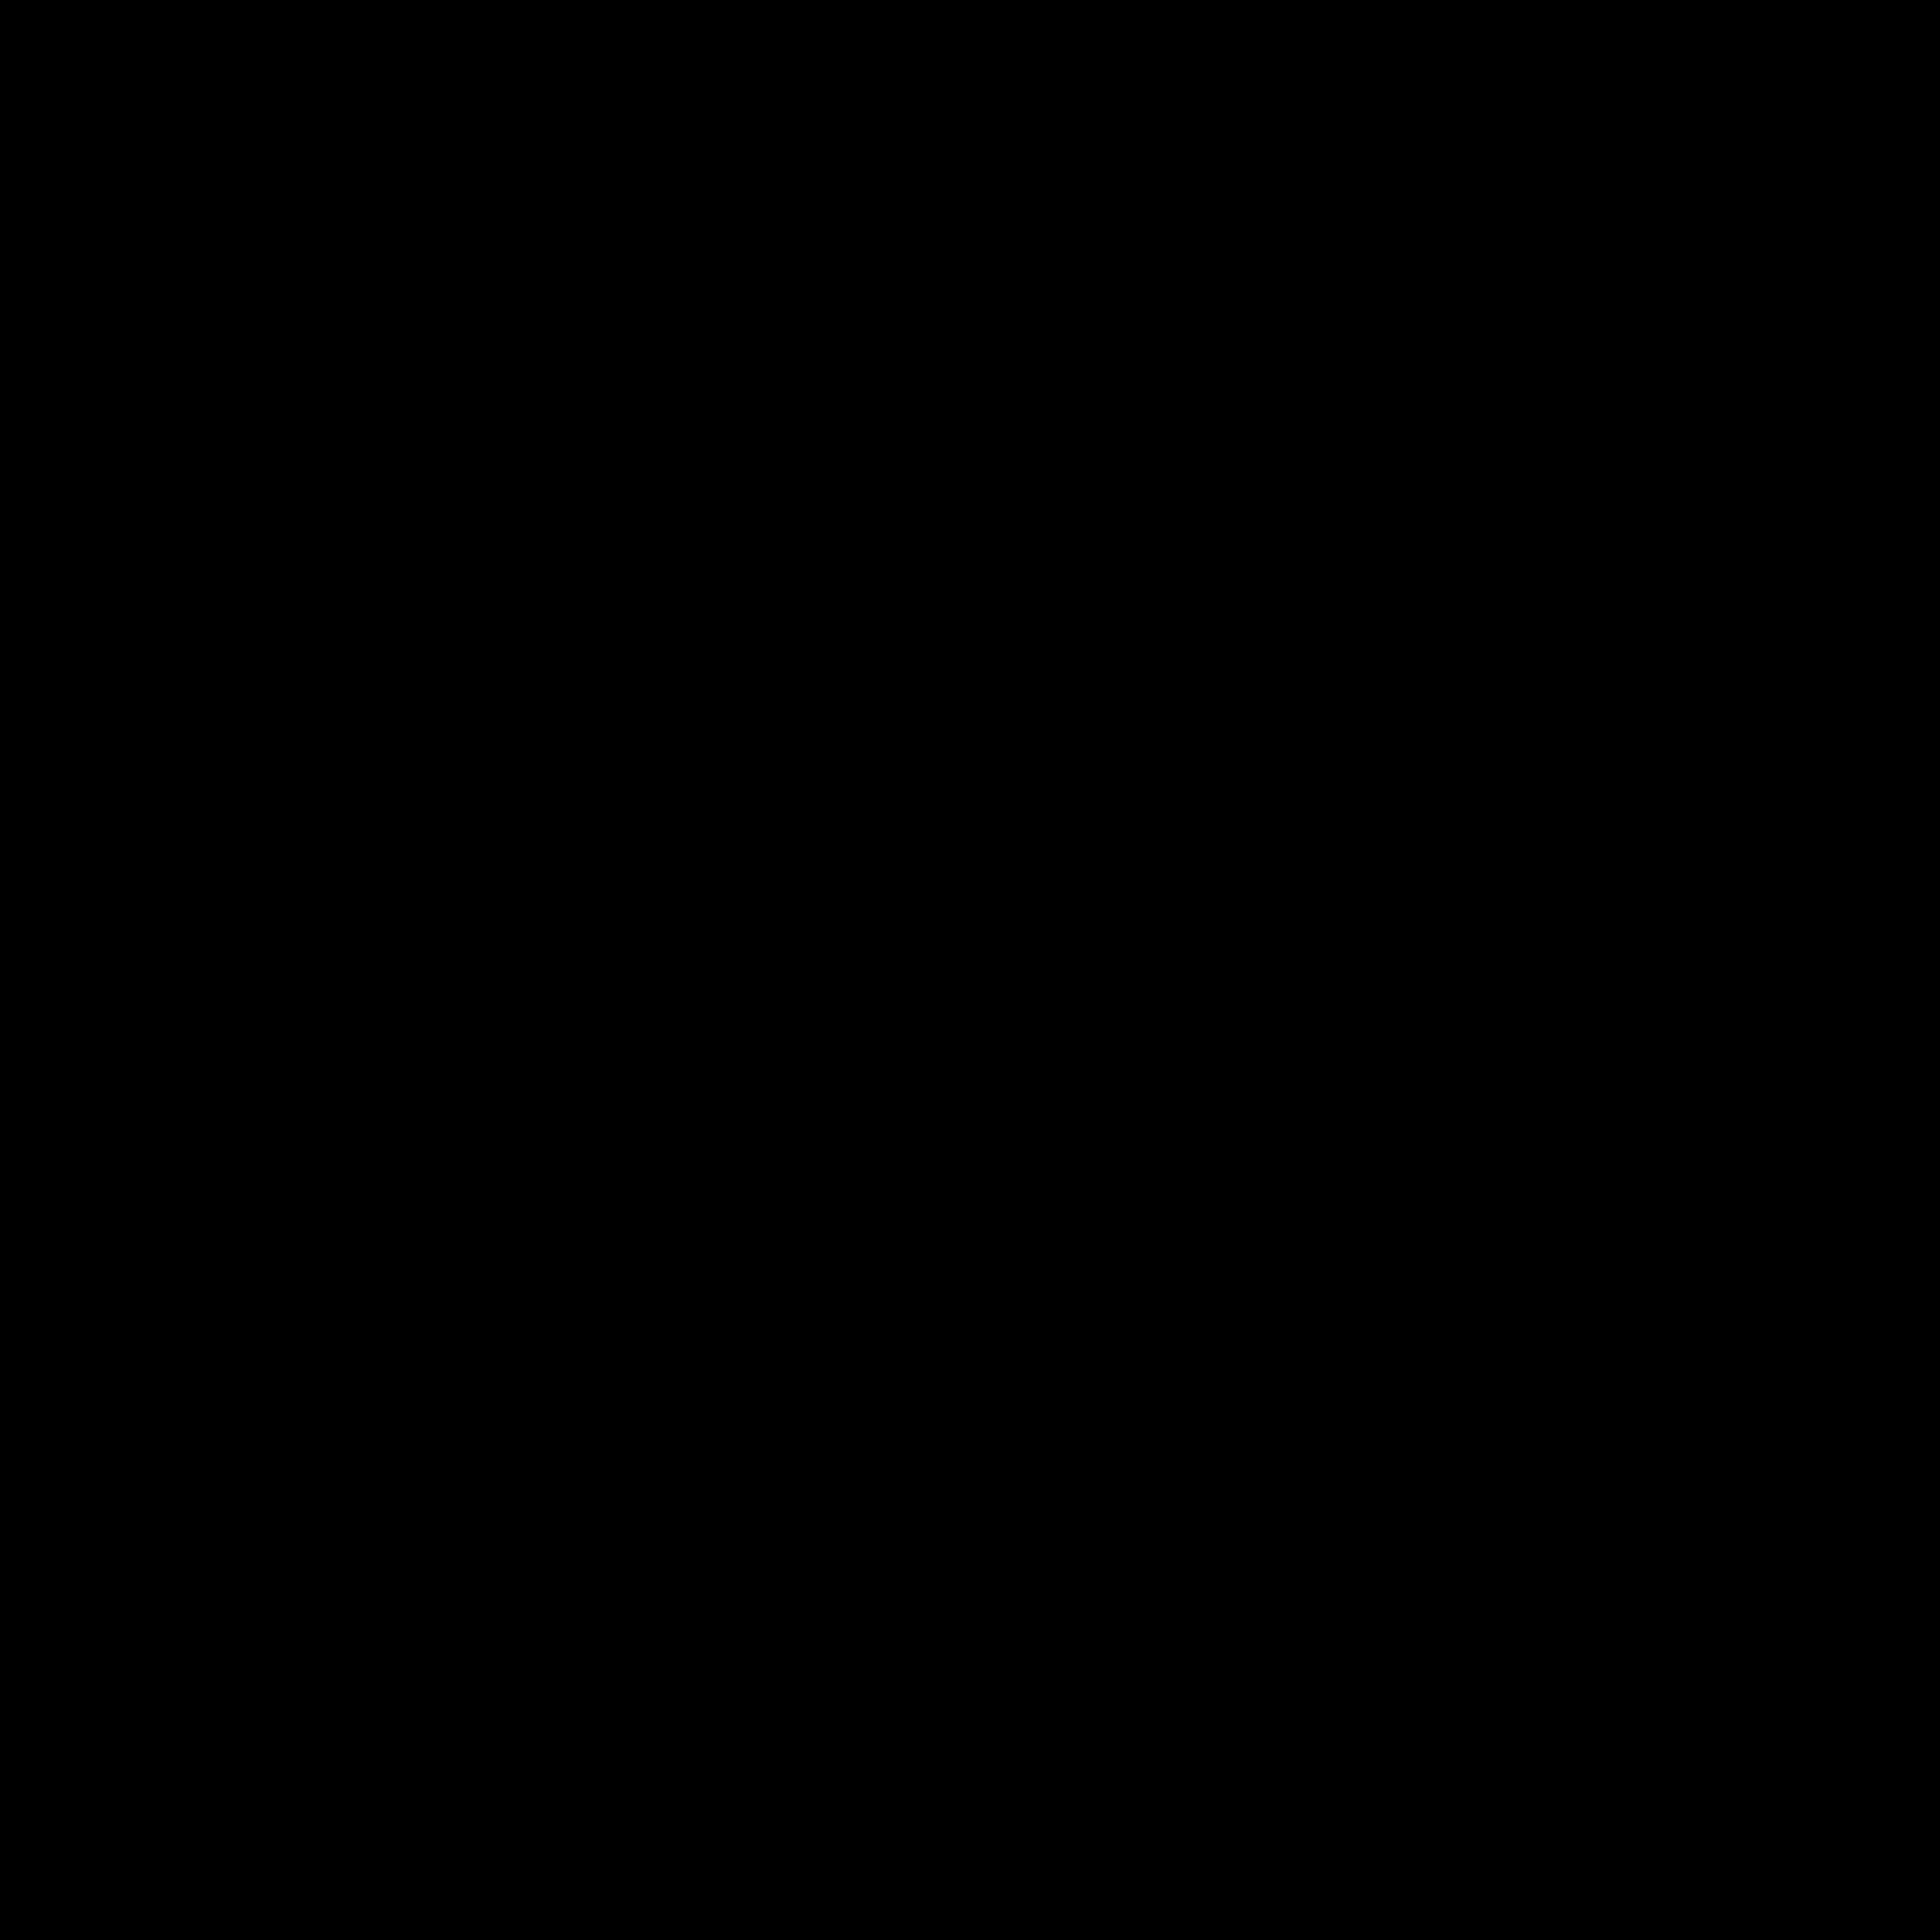 revlon-logo-png-transparent.png